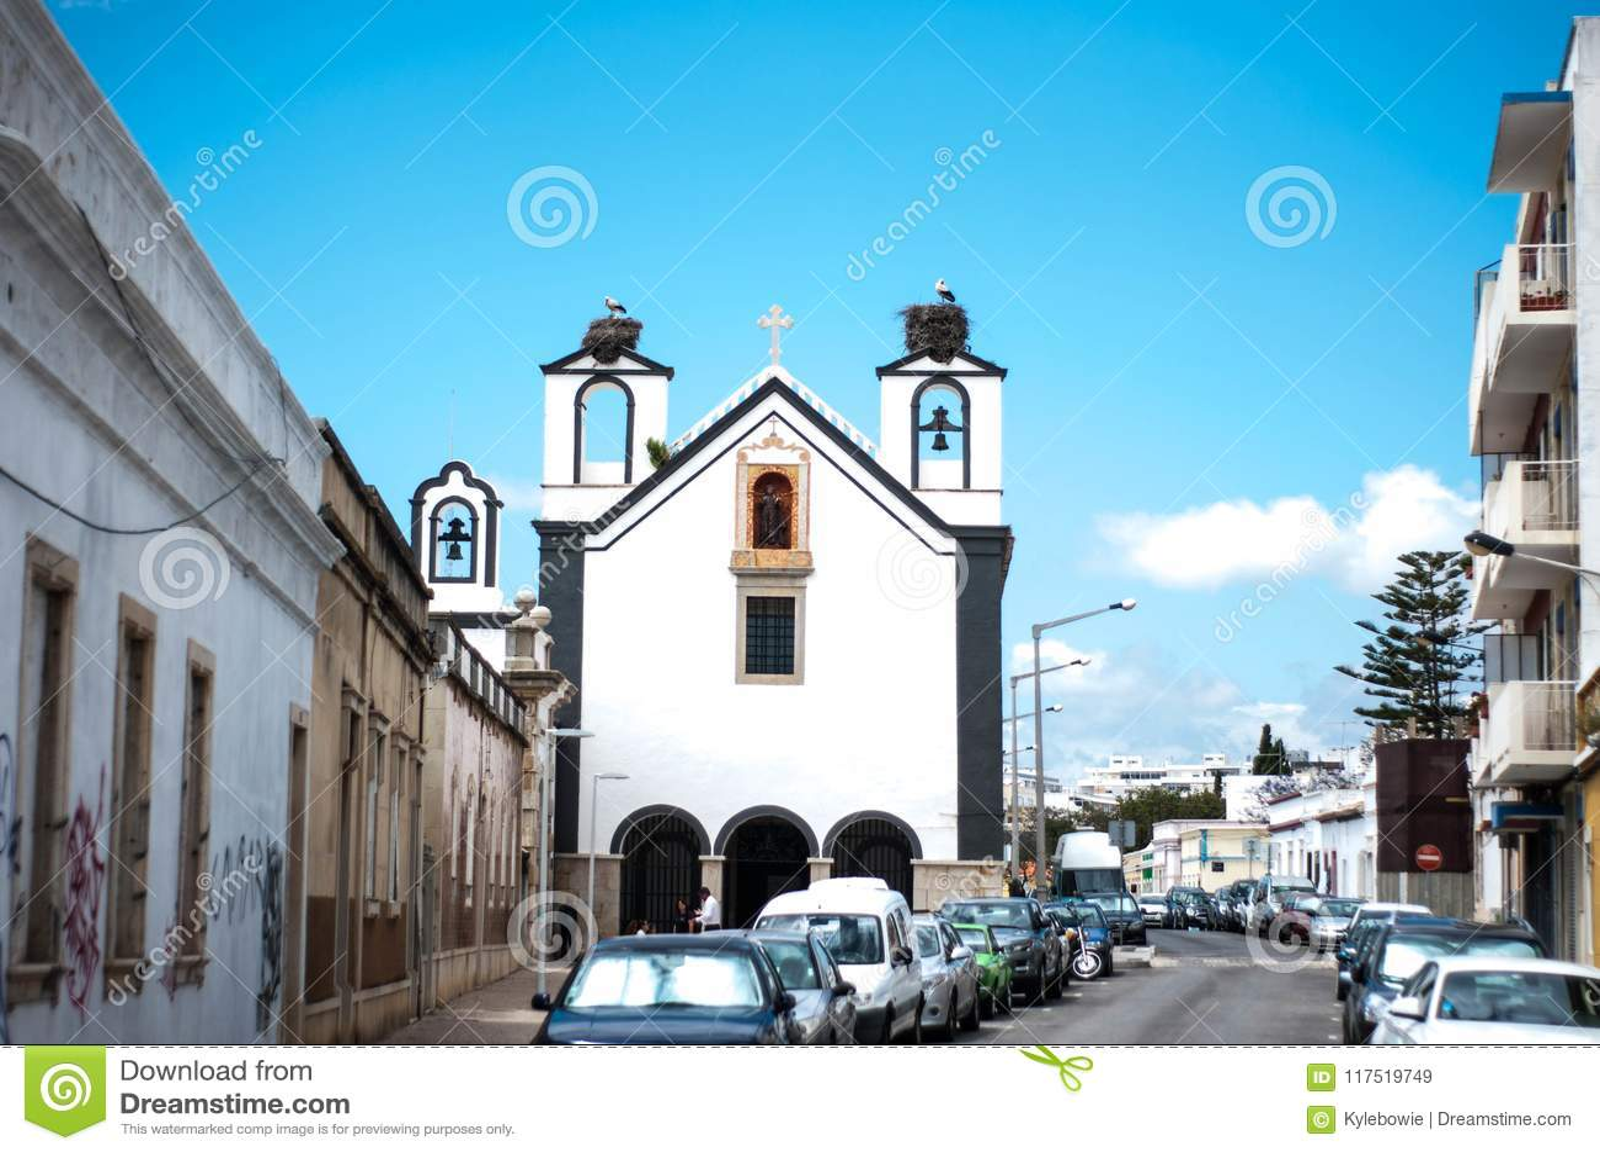 Old church with bird stork nest old city